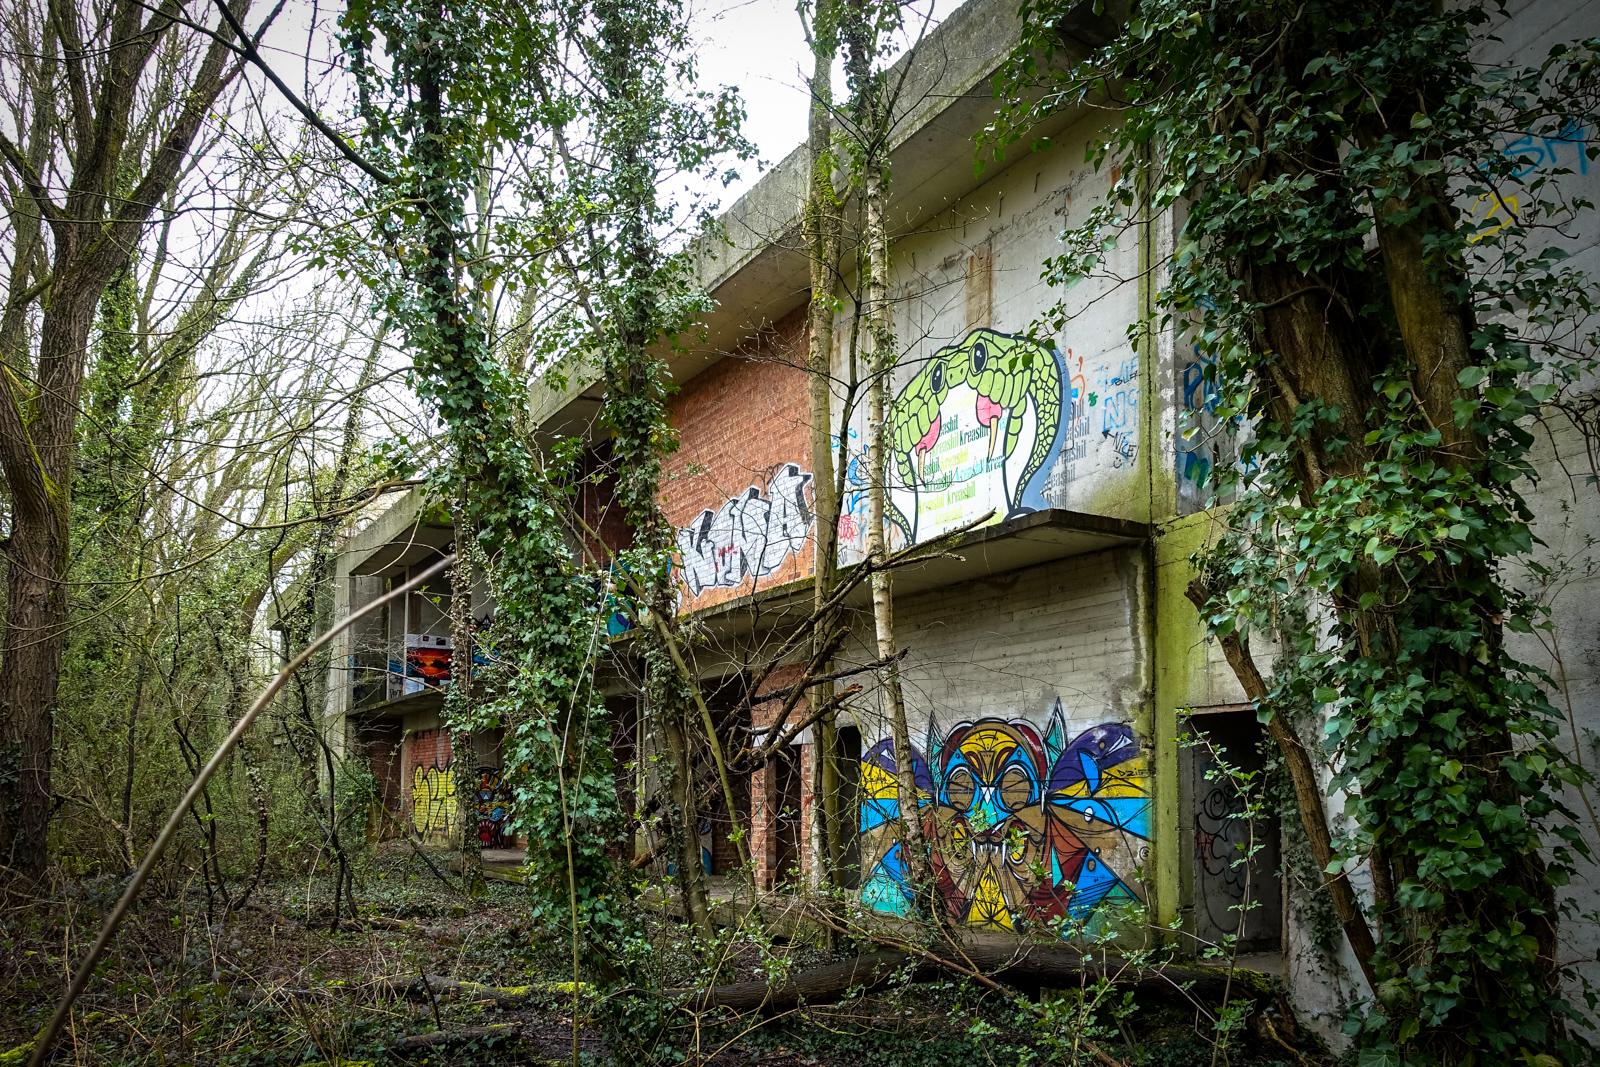 urbex art - swamp hotel, mechelen, belgium